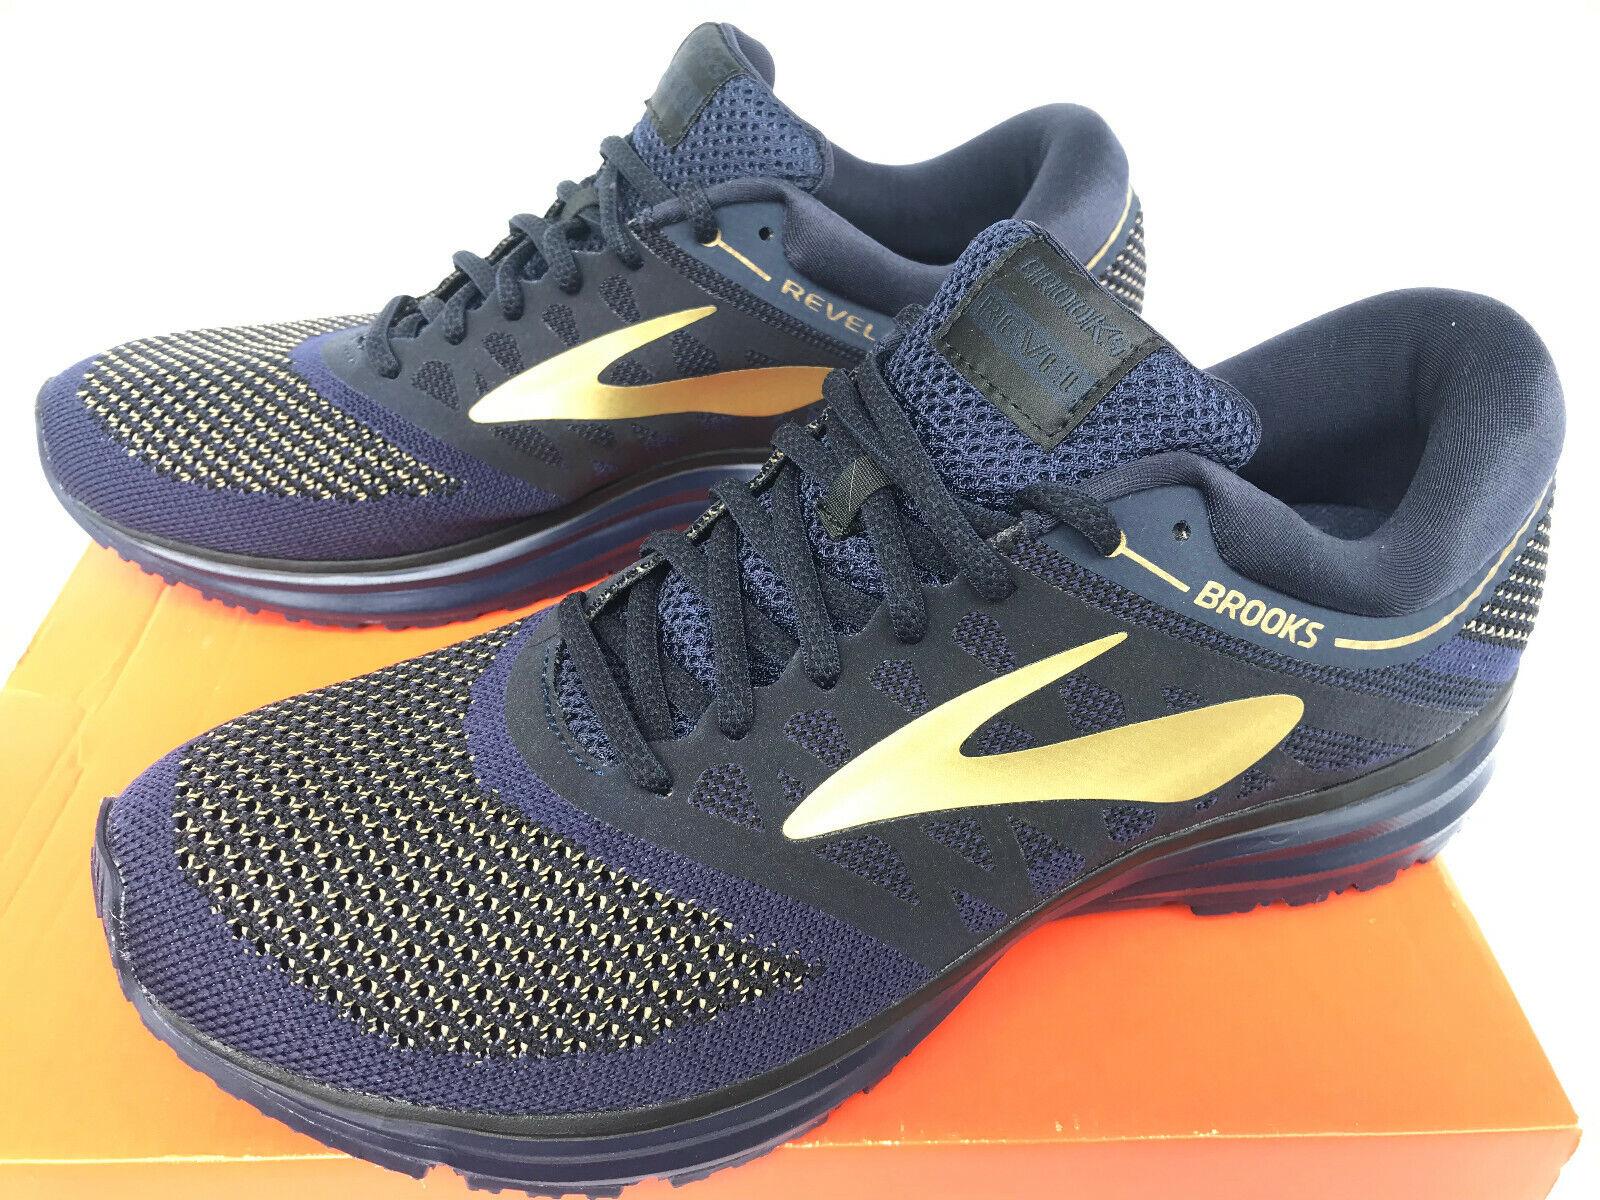 Brooks Revel 1102601D407 neutral Cush Marathon Road Zapatillas Para Correr Para hombres 10 Nuevo